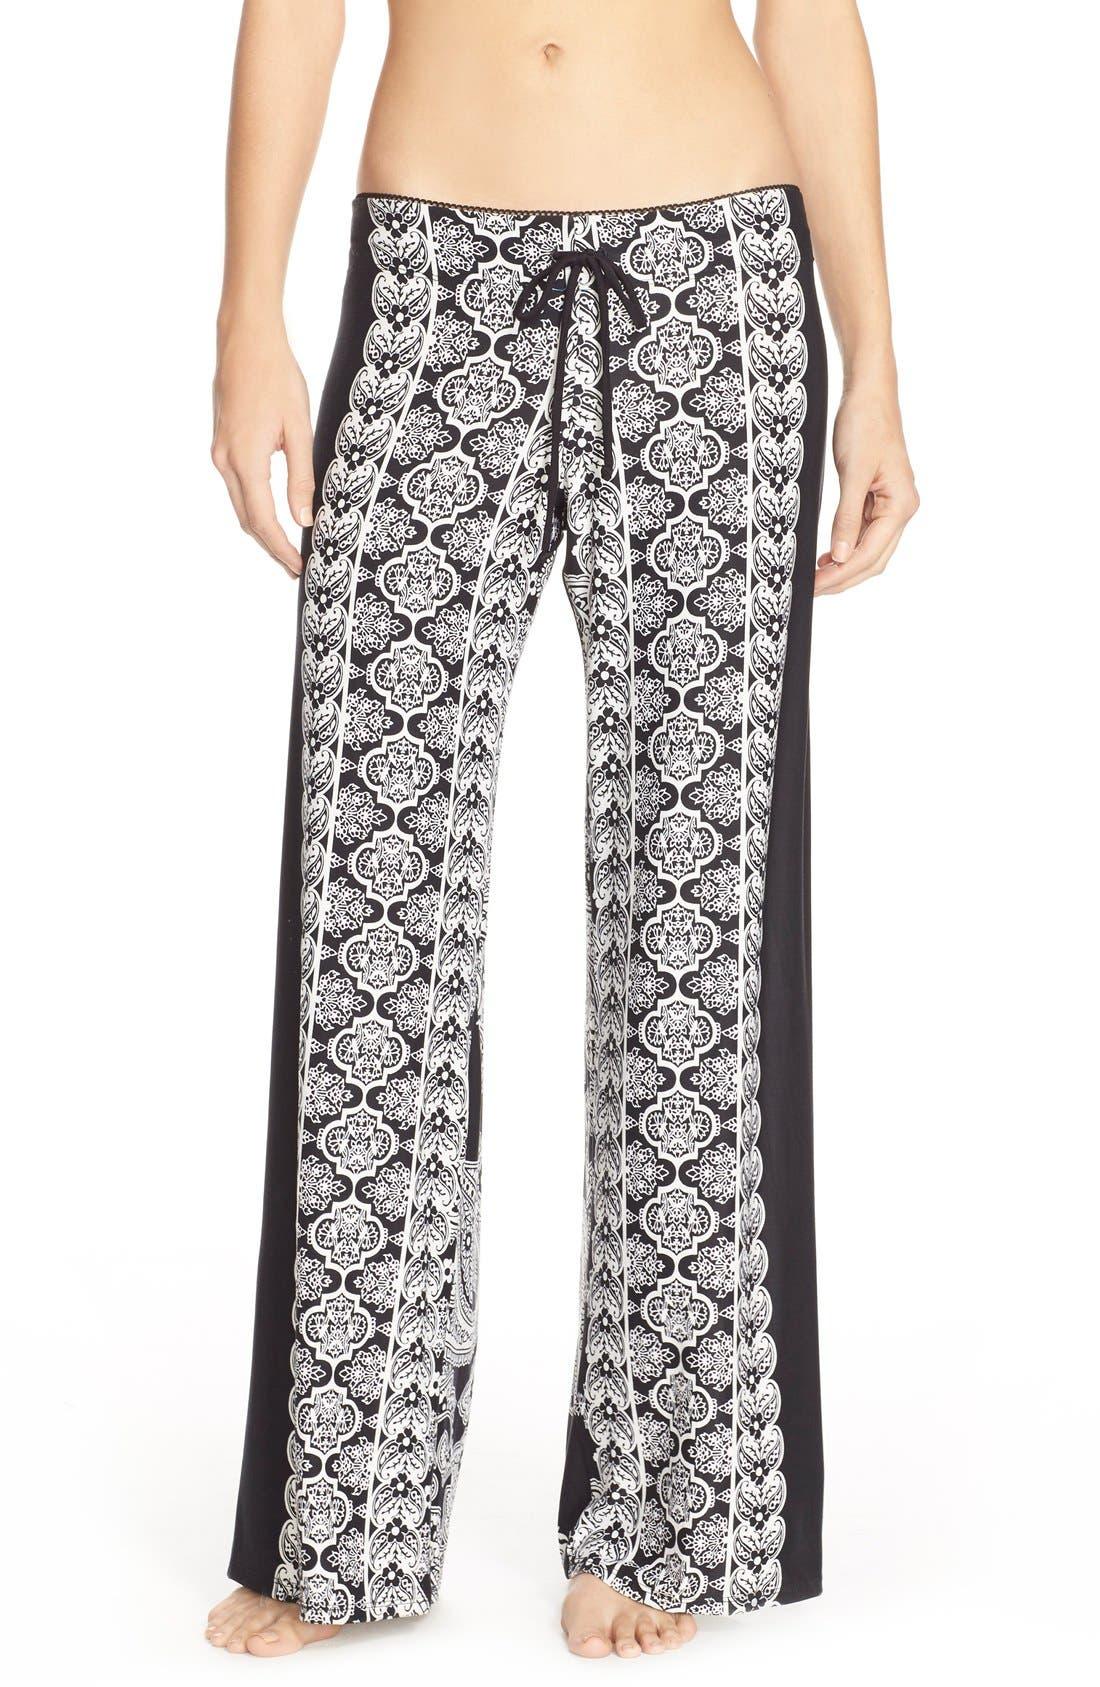 Alternate Image 1 Selected - In Bloom by Jonquil Print Pajama Pants